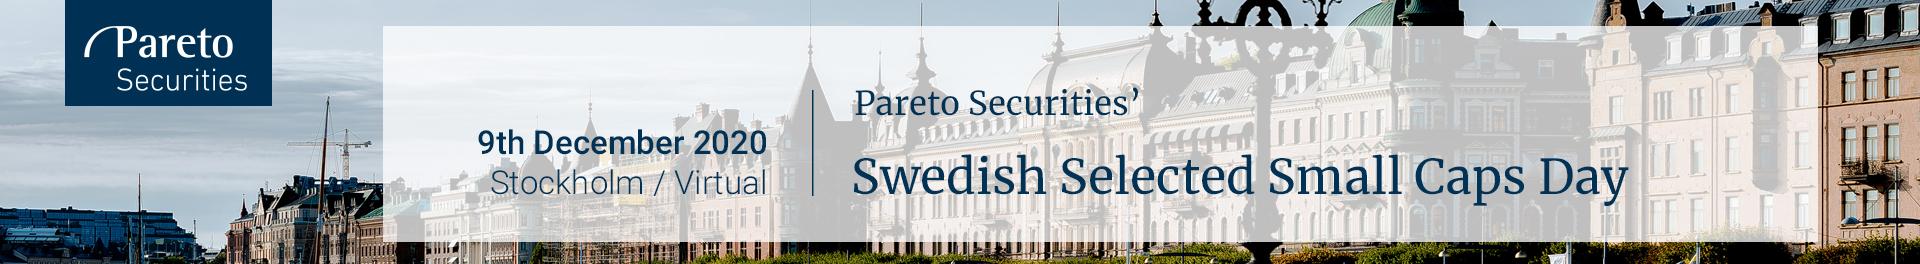 Huvudbild för Pareto Securities' Swedish Selected Small Caps Day